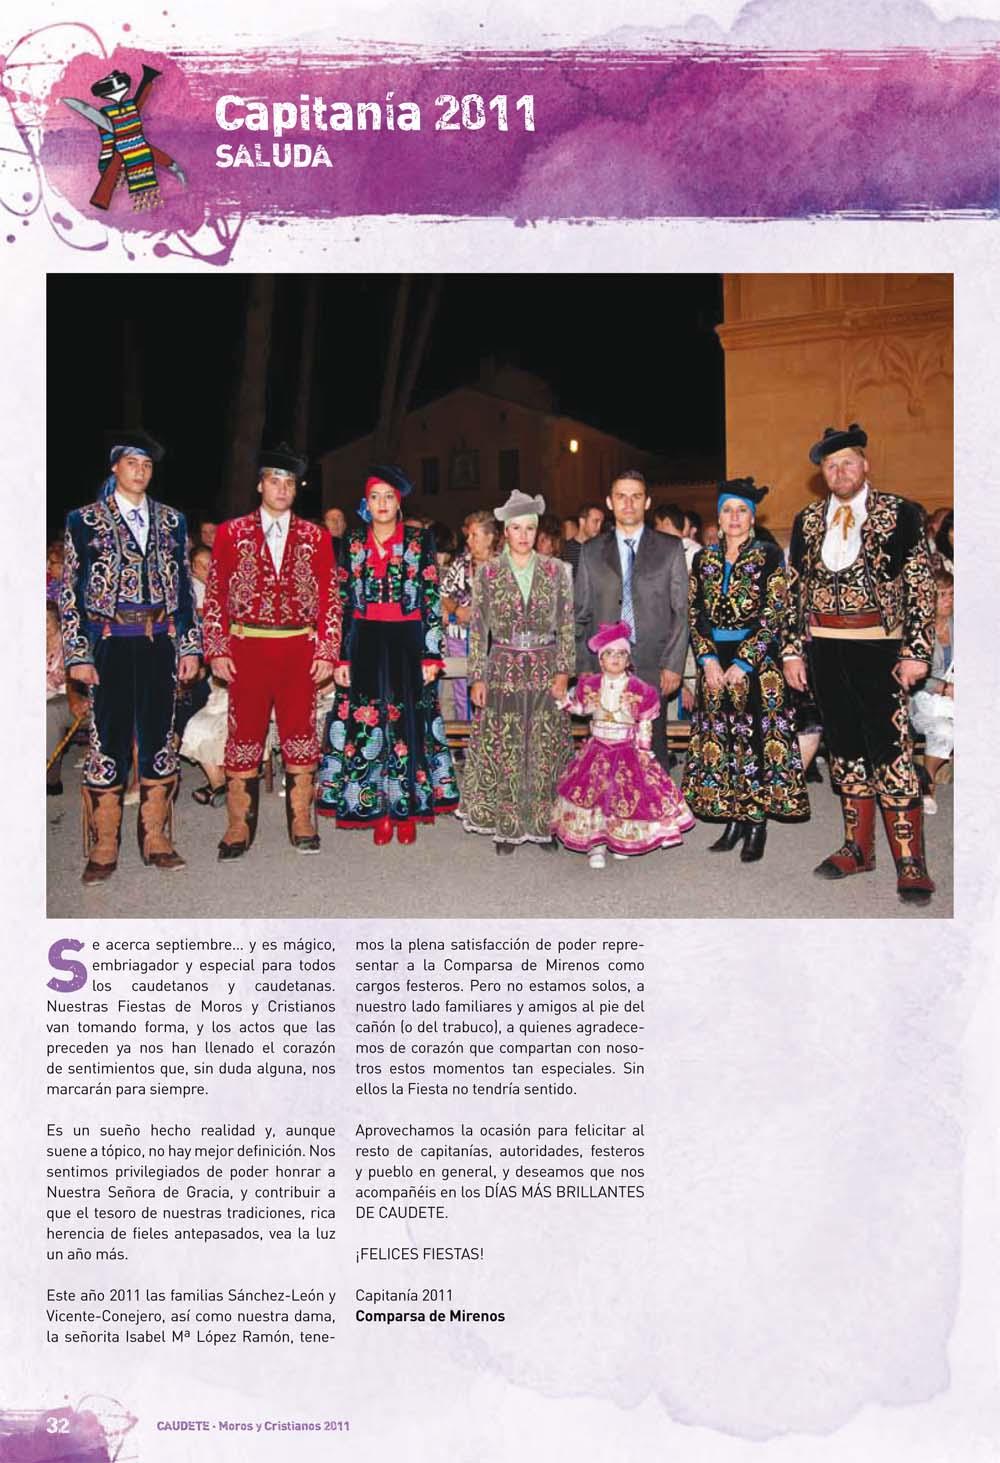 saluda_capitania_2011